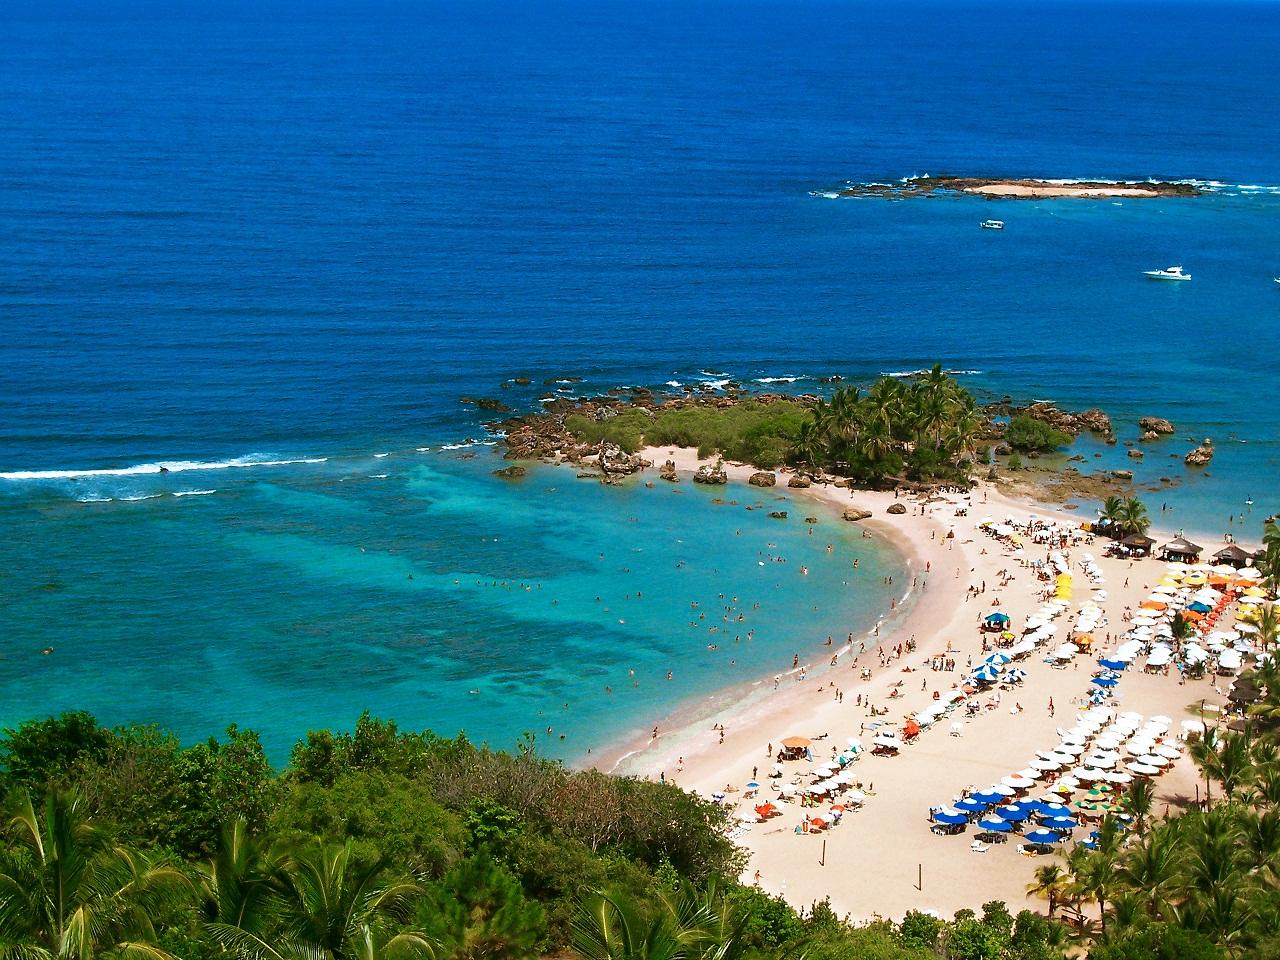 10 playas que debes visitar antes de morir 2